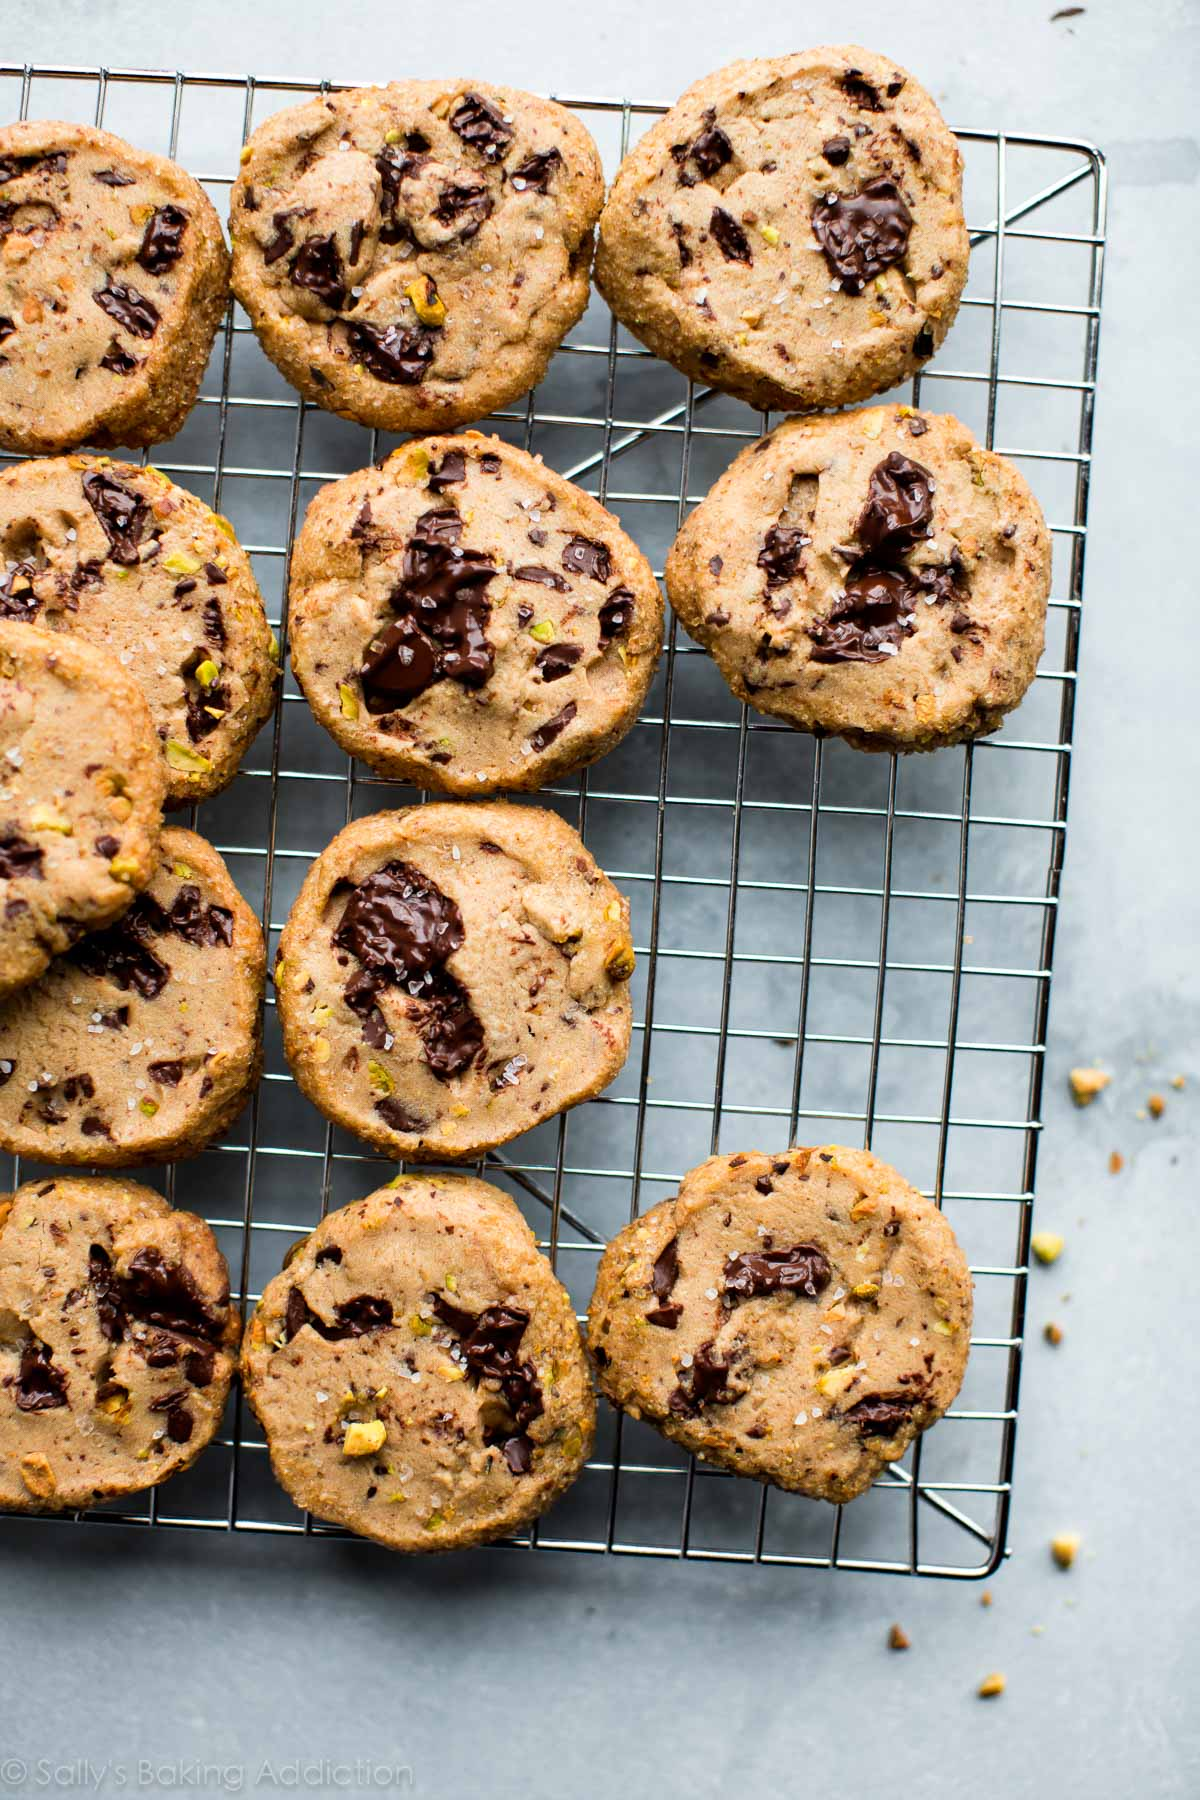 Salted pistachio chocolate chunk cookies have pistachio chunks, dark chocolate, brown sugar, sea salt, and a crunchy sugar edge! Recipe on sallysbakingaddiction.com